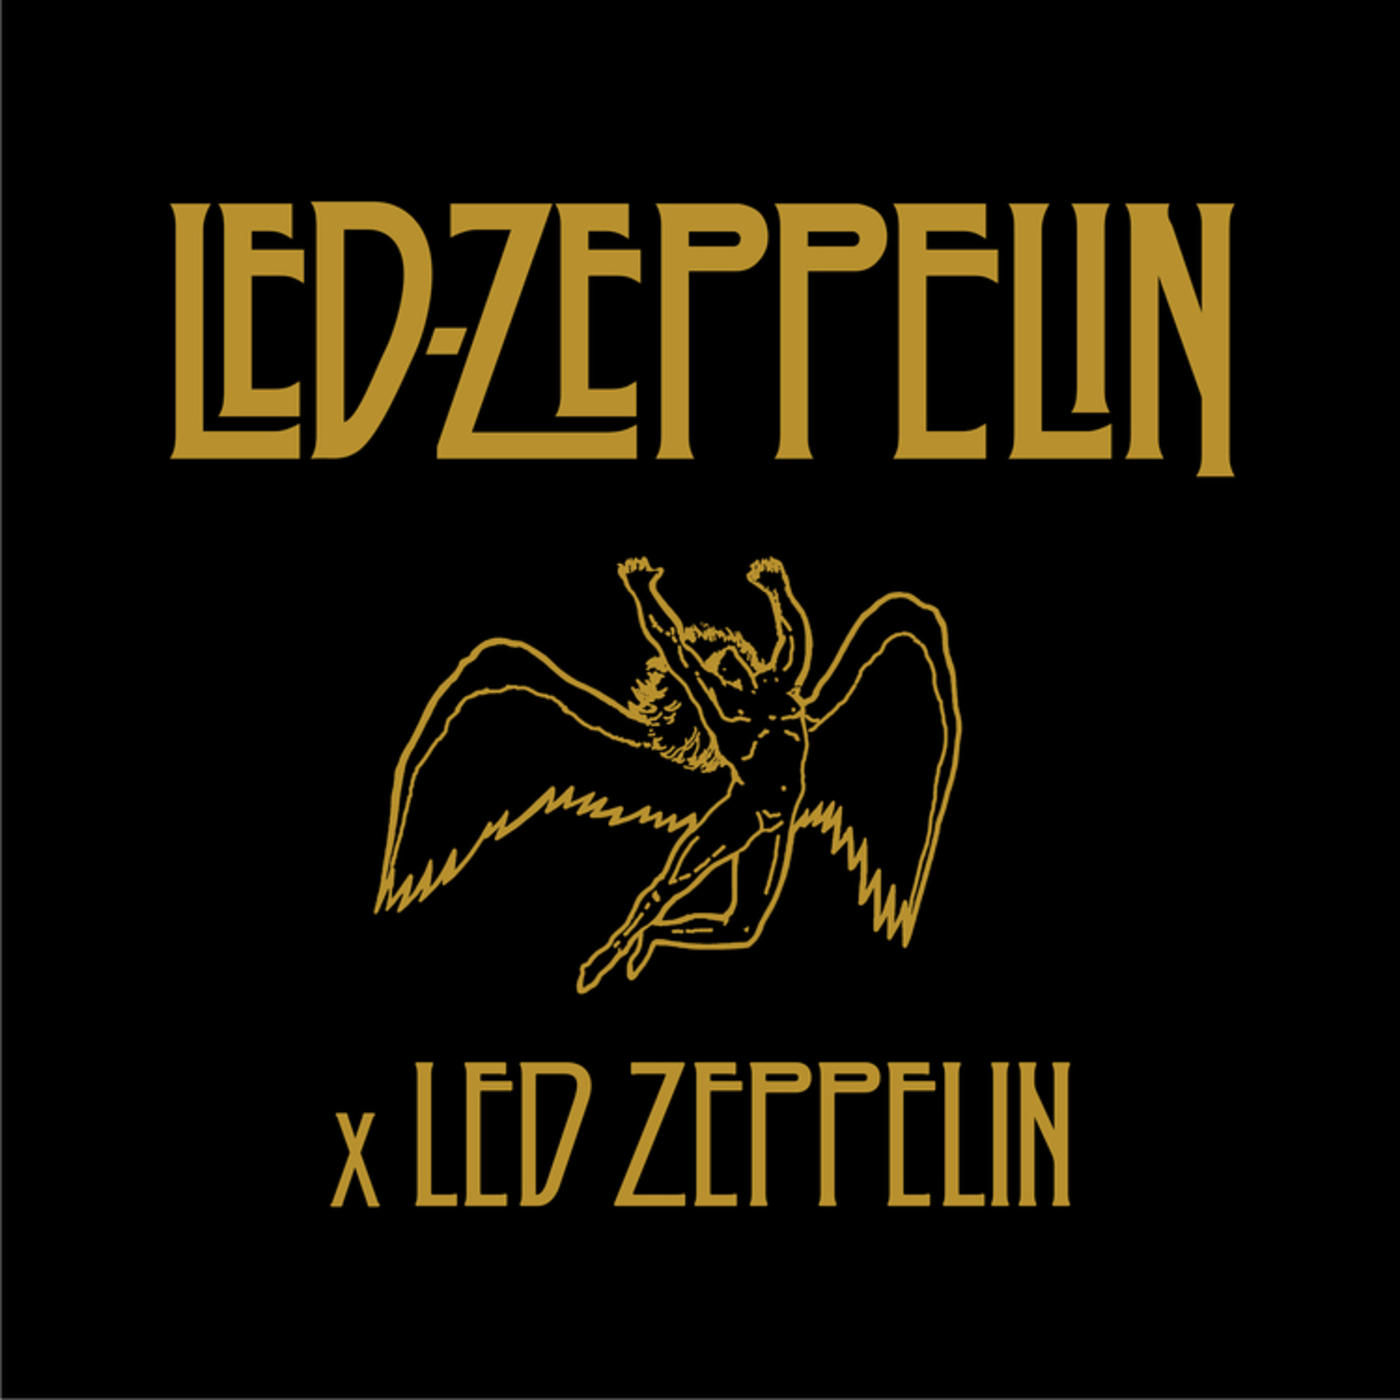 Led Zeppelin - Led Zeppelin x Led Zeppelin | Rhino